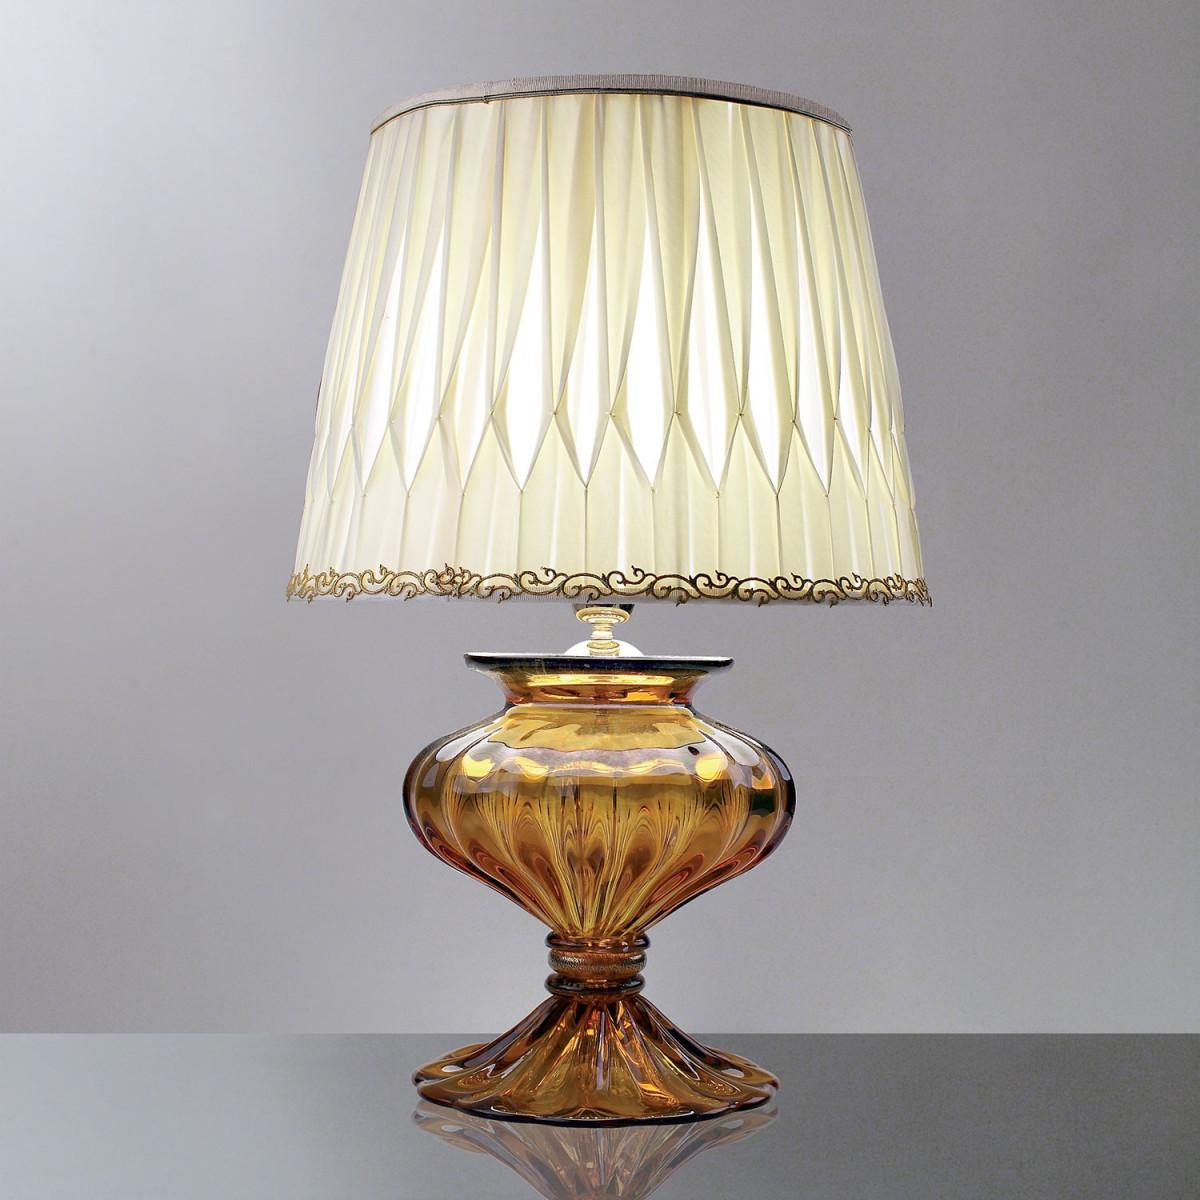 """Chloe"" Murano glass table lamp"